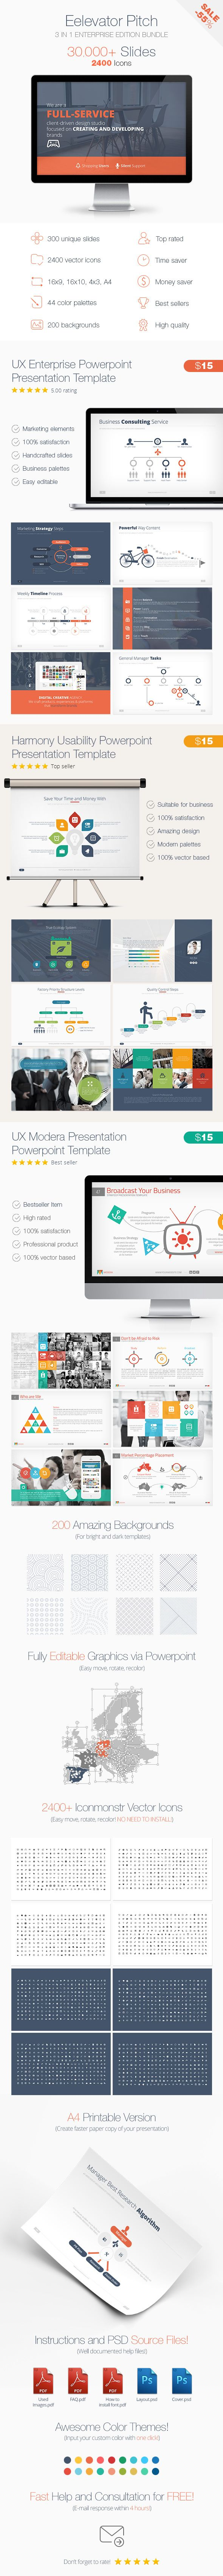 Elevator Pitch Powerpoint Presentation Bundle  Business